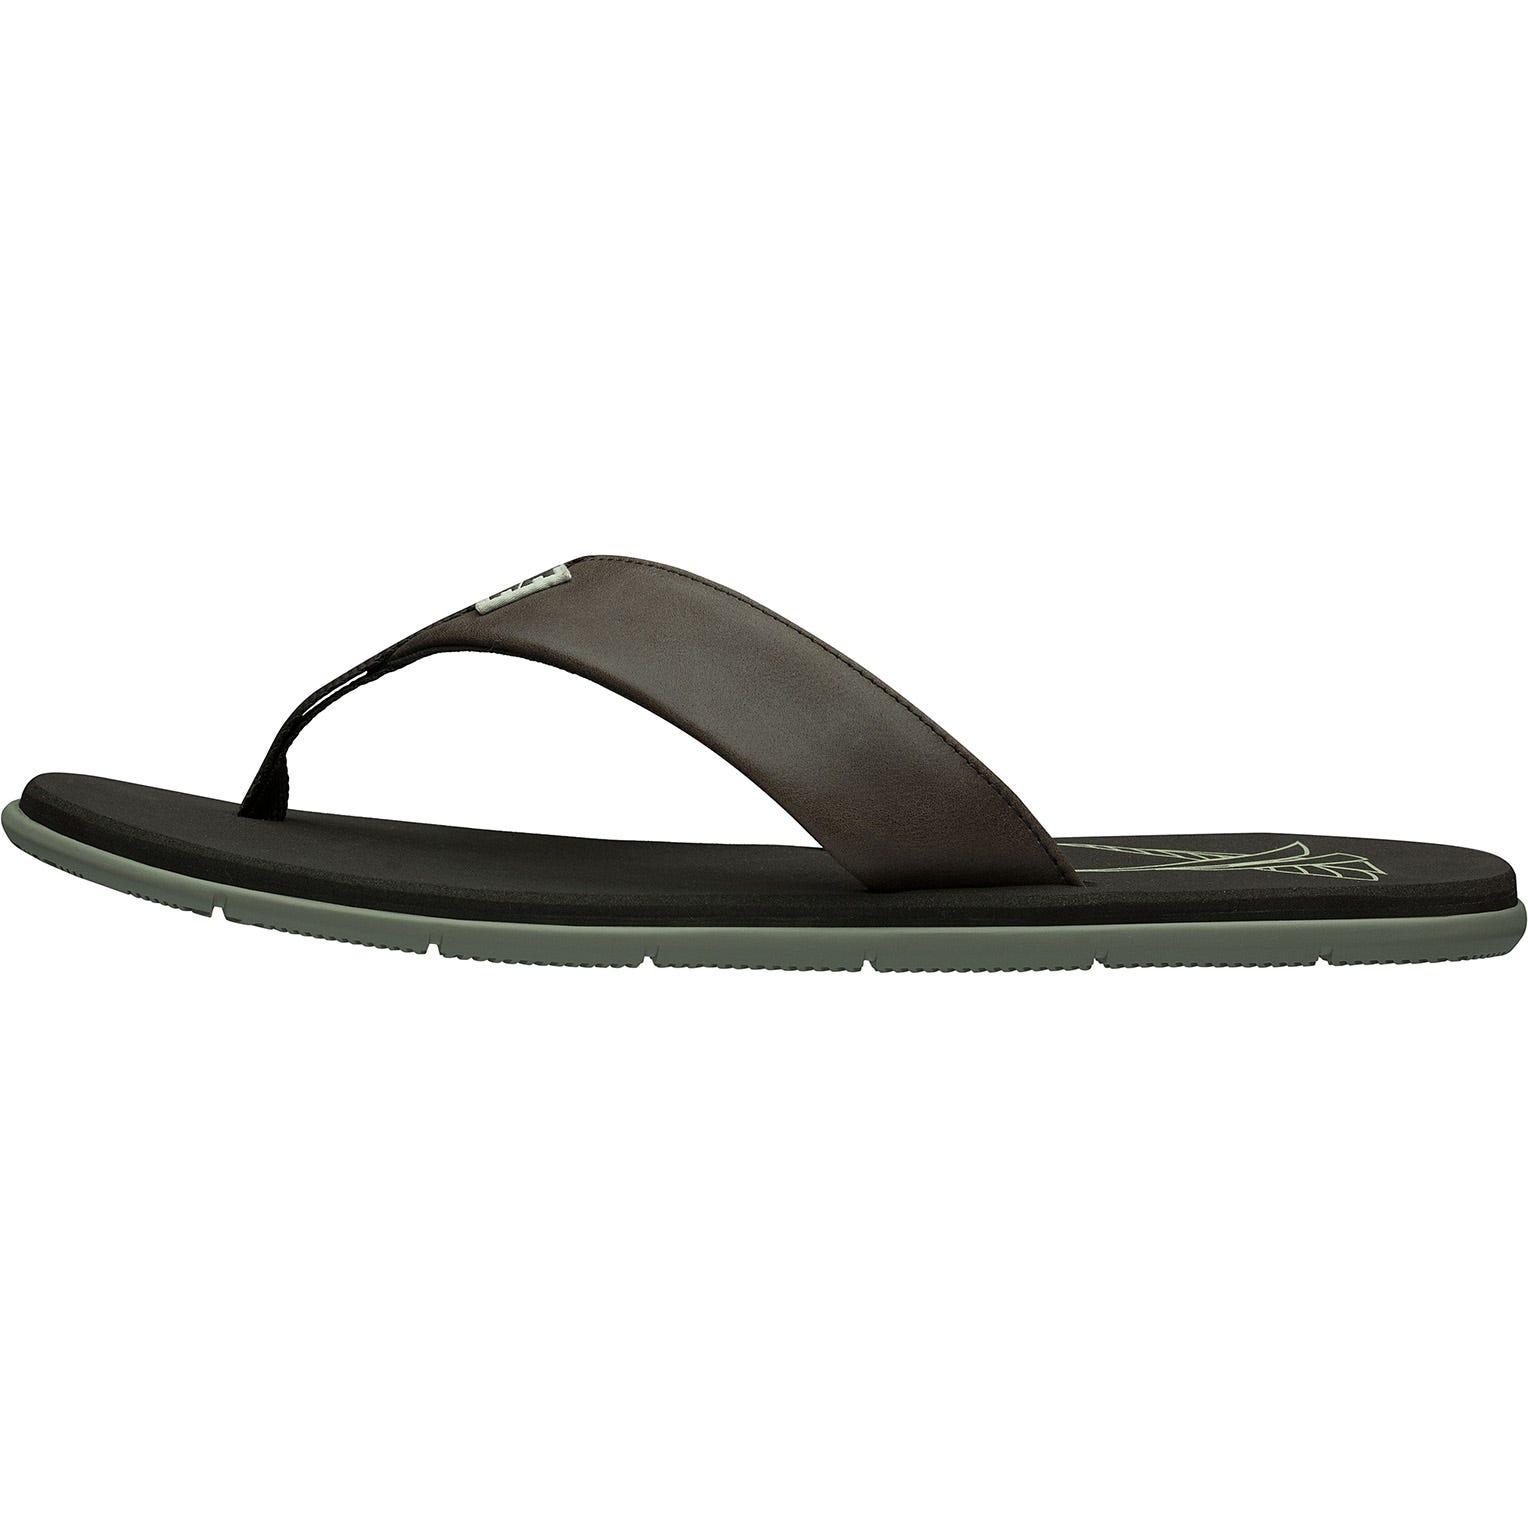 Helly Hansen Seasand Leather Sandal Mens Brown 44/10